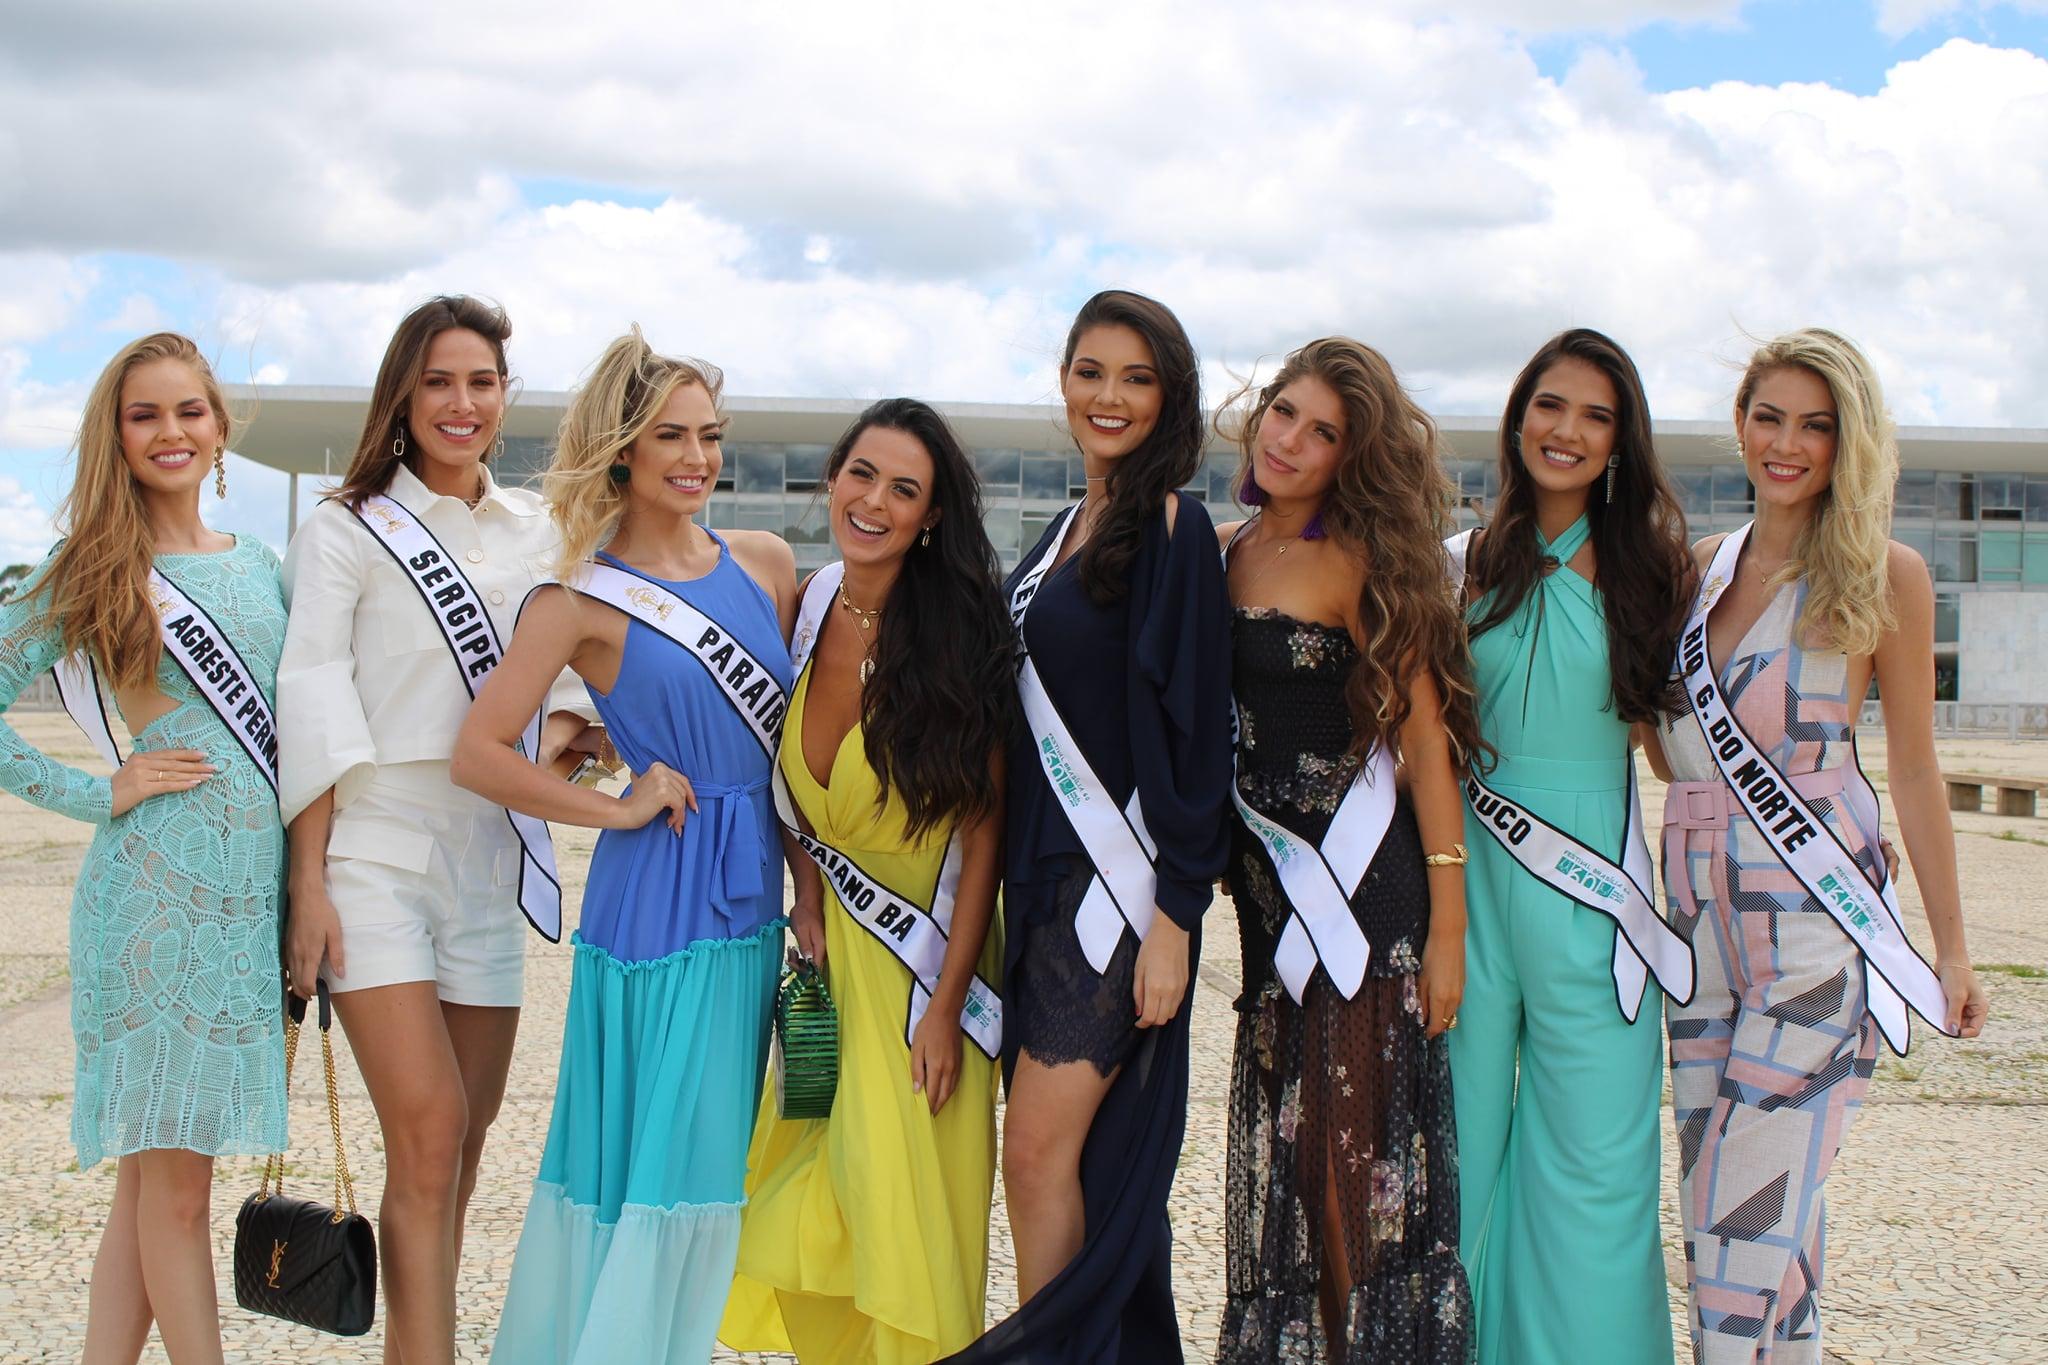 bruna zanardo, 1st runner-up de miss supranational brazil 2020/miss brasil internacional 2017/miss brasil terra 2016. - Página 17 12651010